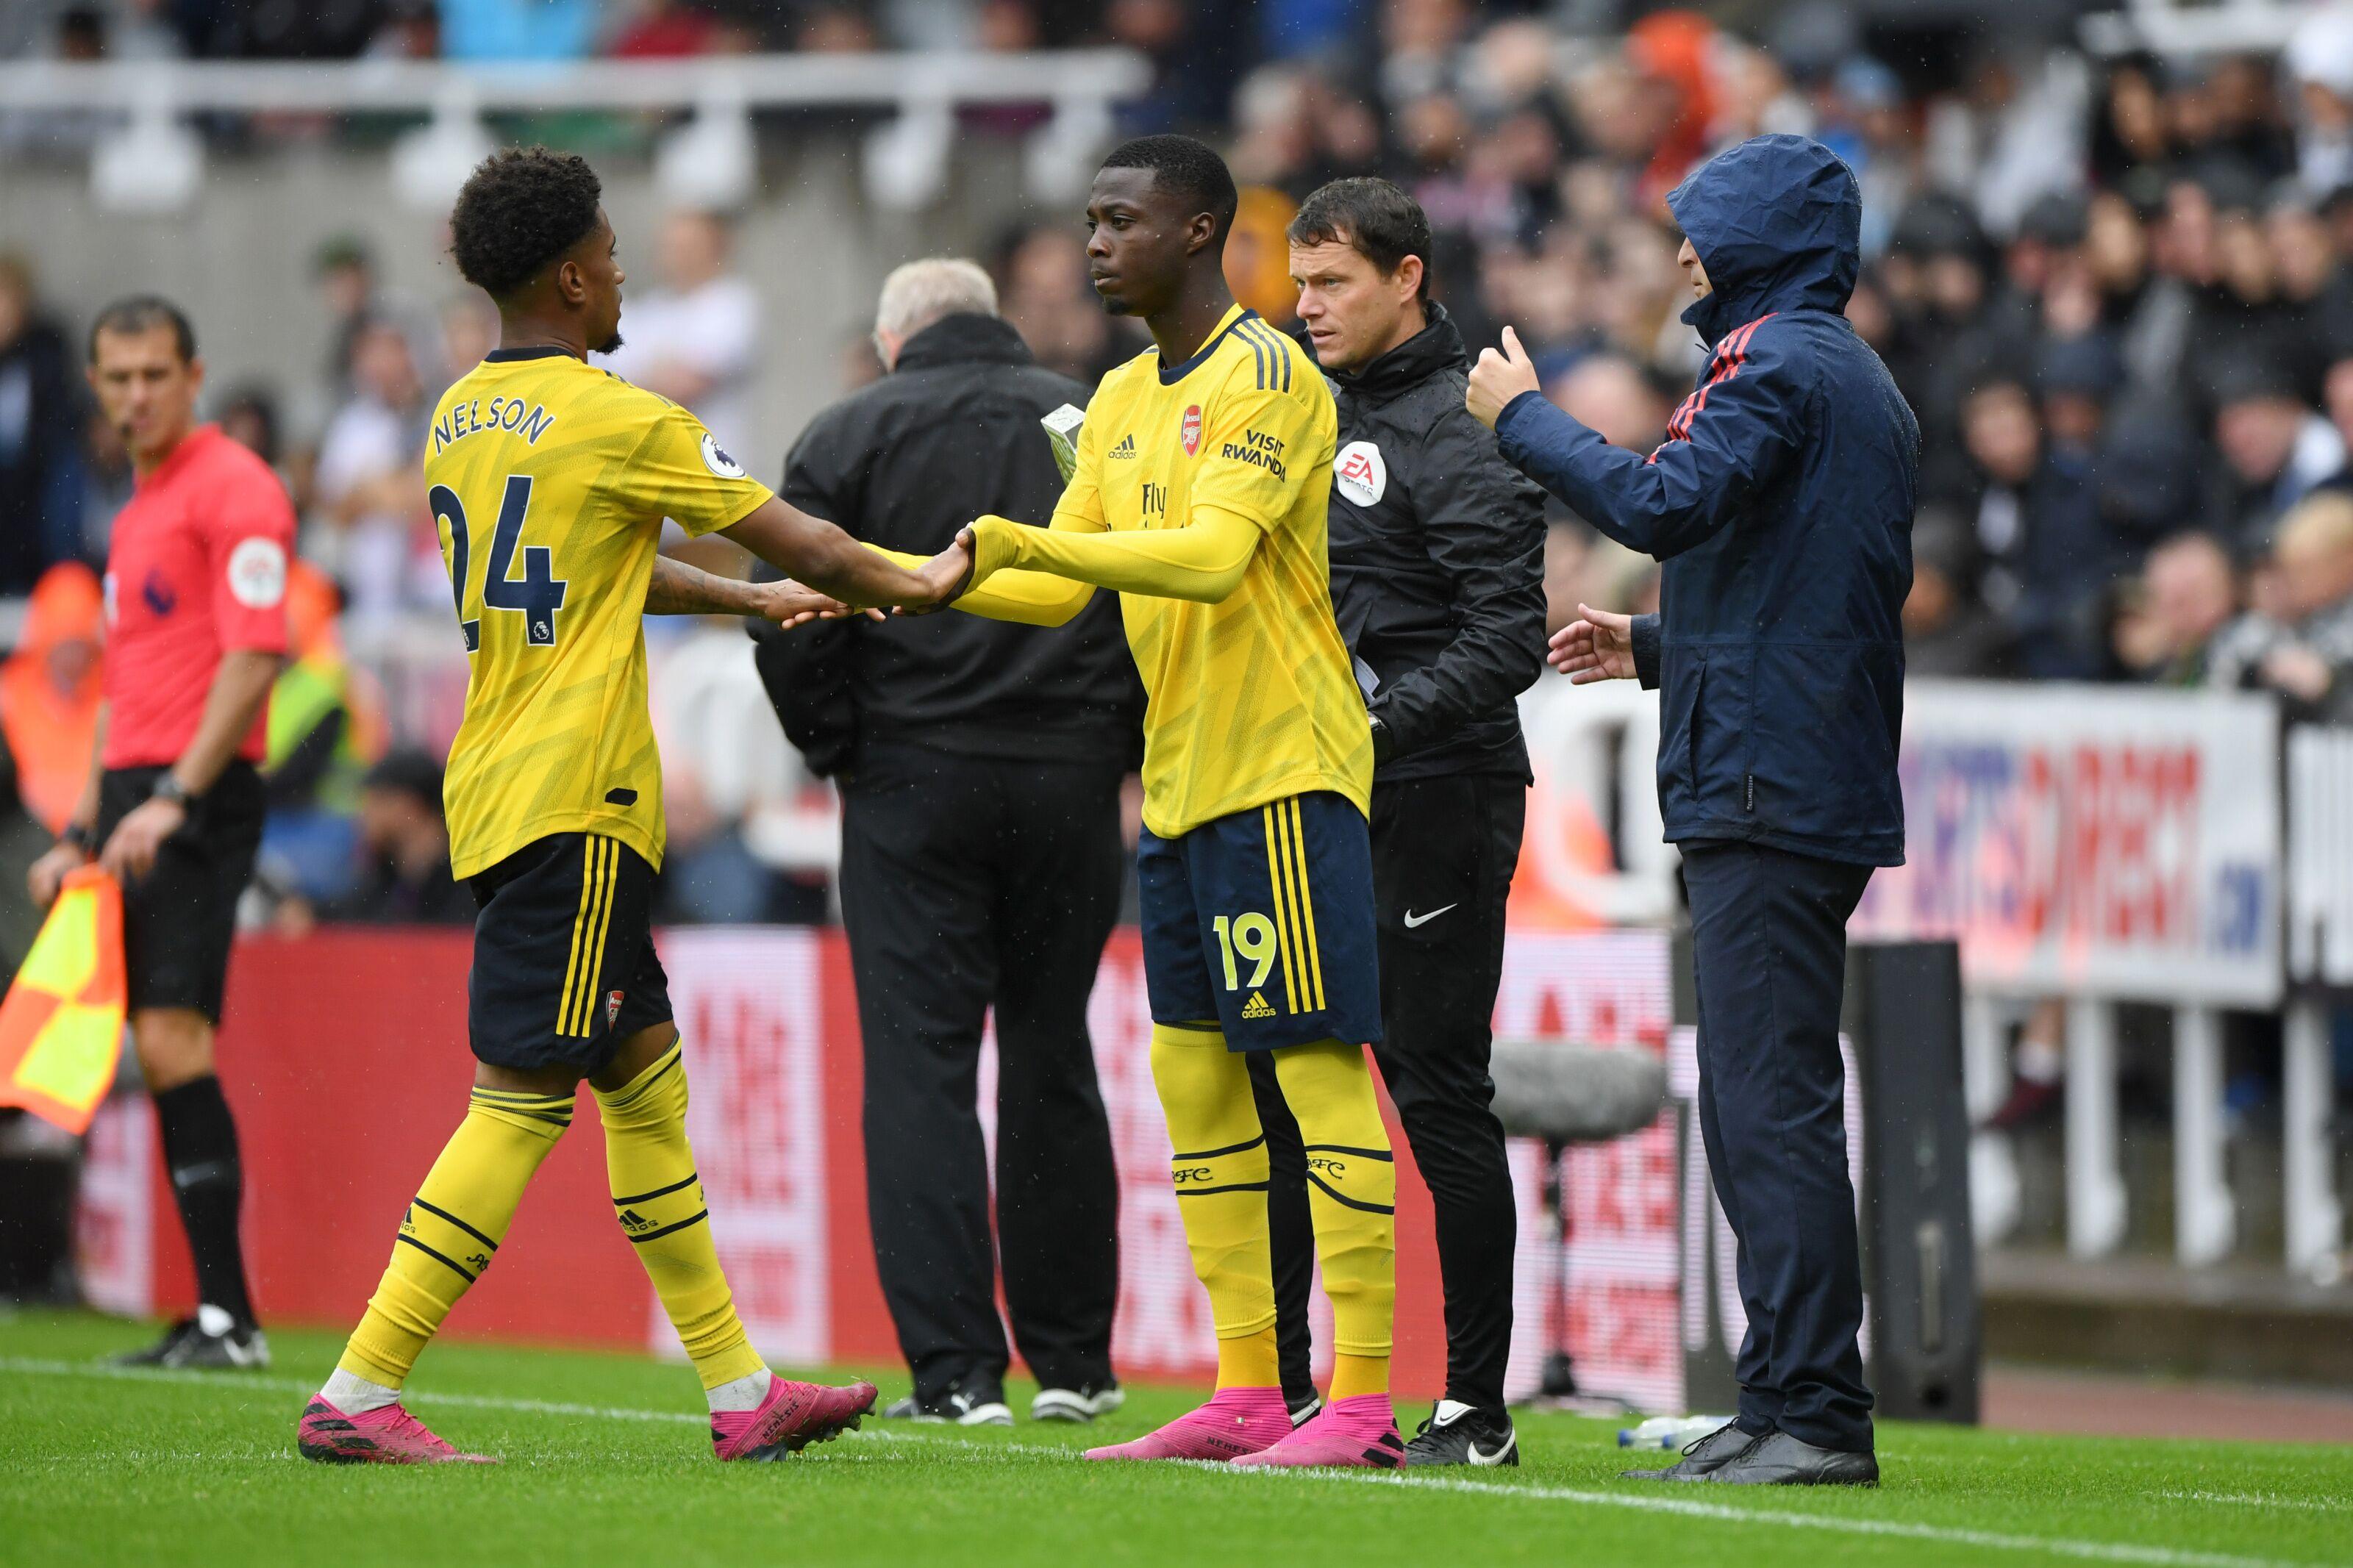 Arsenal vs Burnley: Nicolas Pepe probably isn't going to start